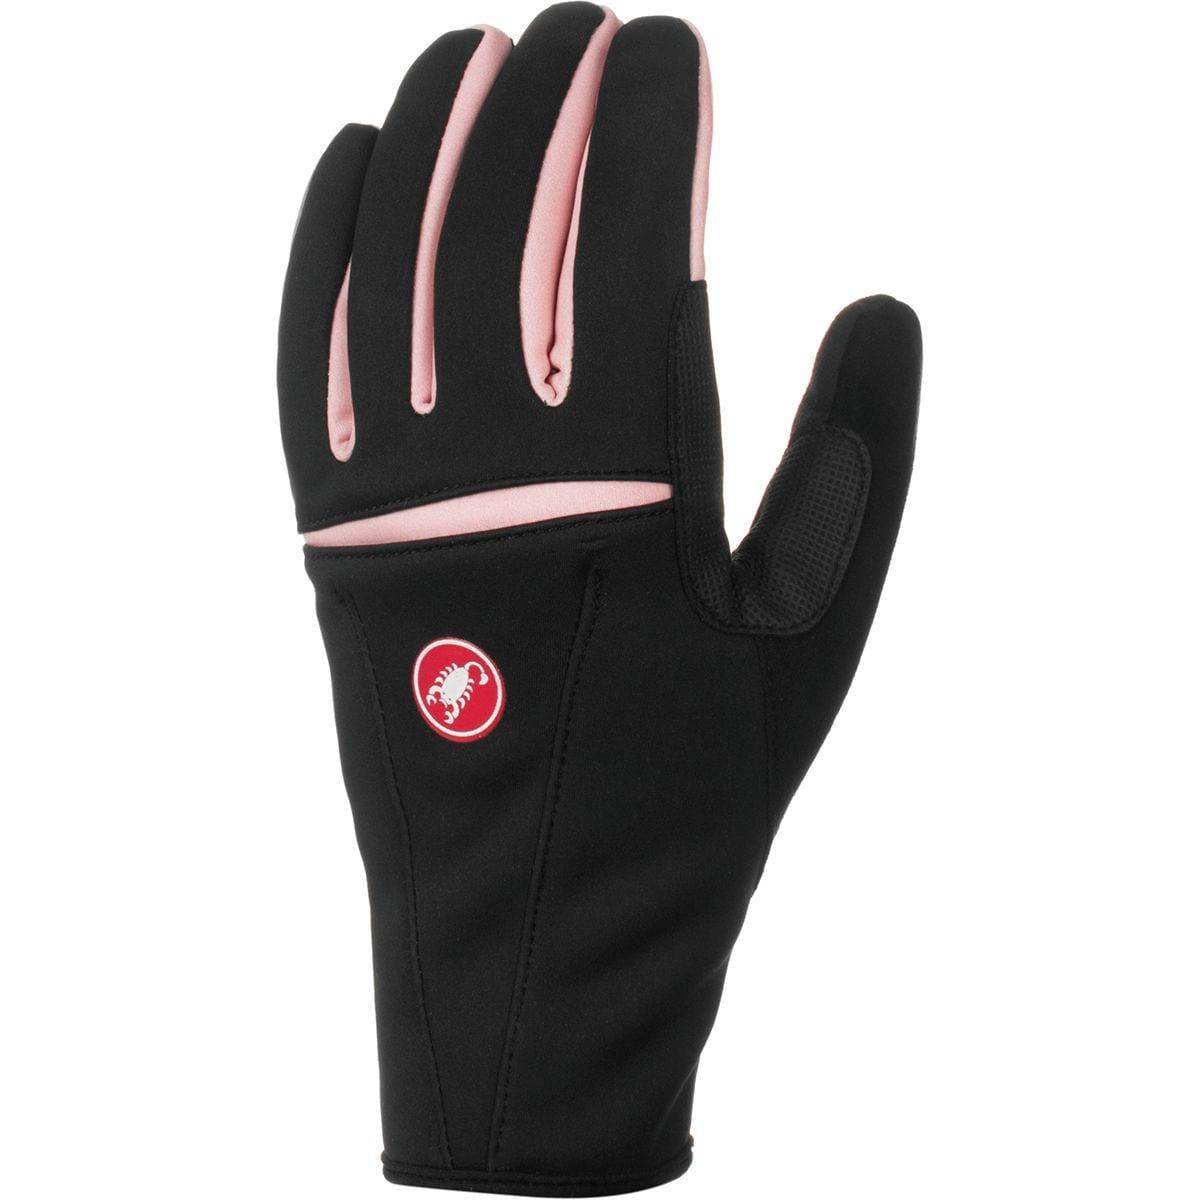 Castelli Cromo Gloves - Women's